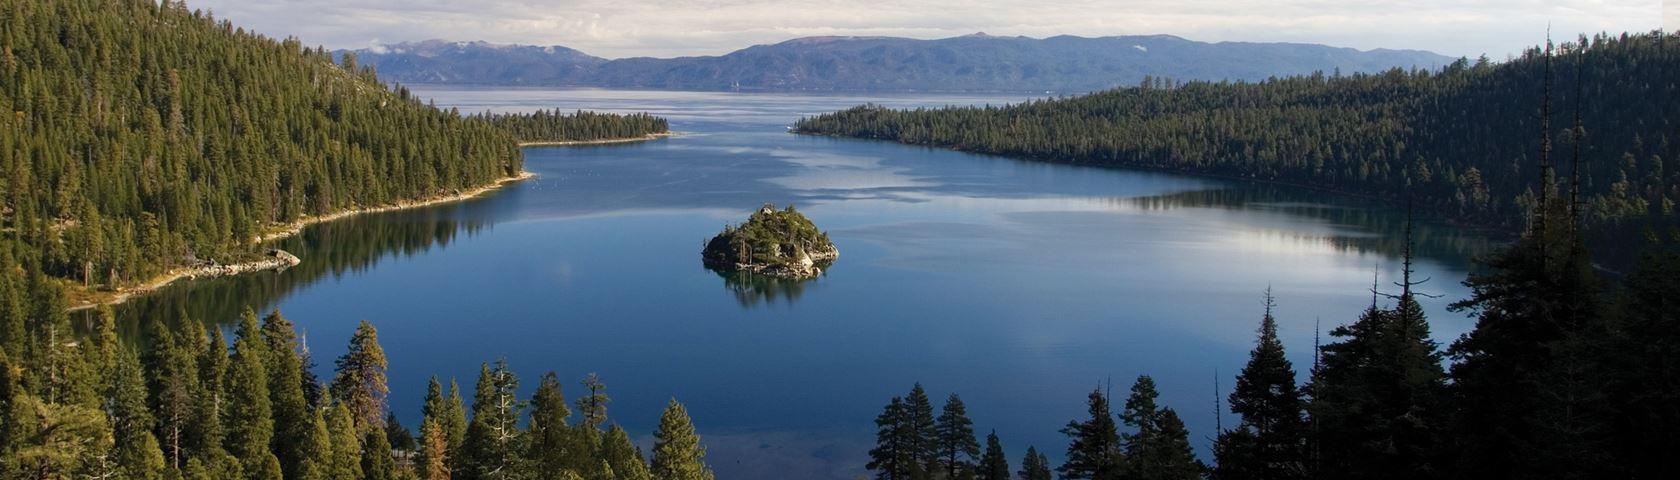 Emerald Bay, with Fannette Island, Lake Tahoe, CA